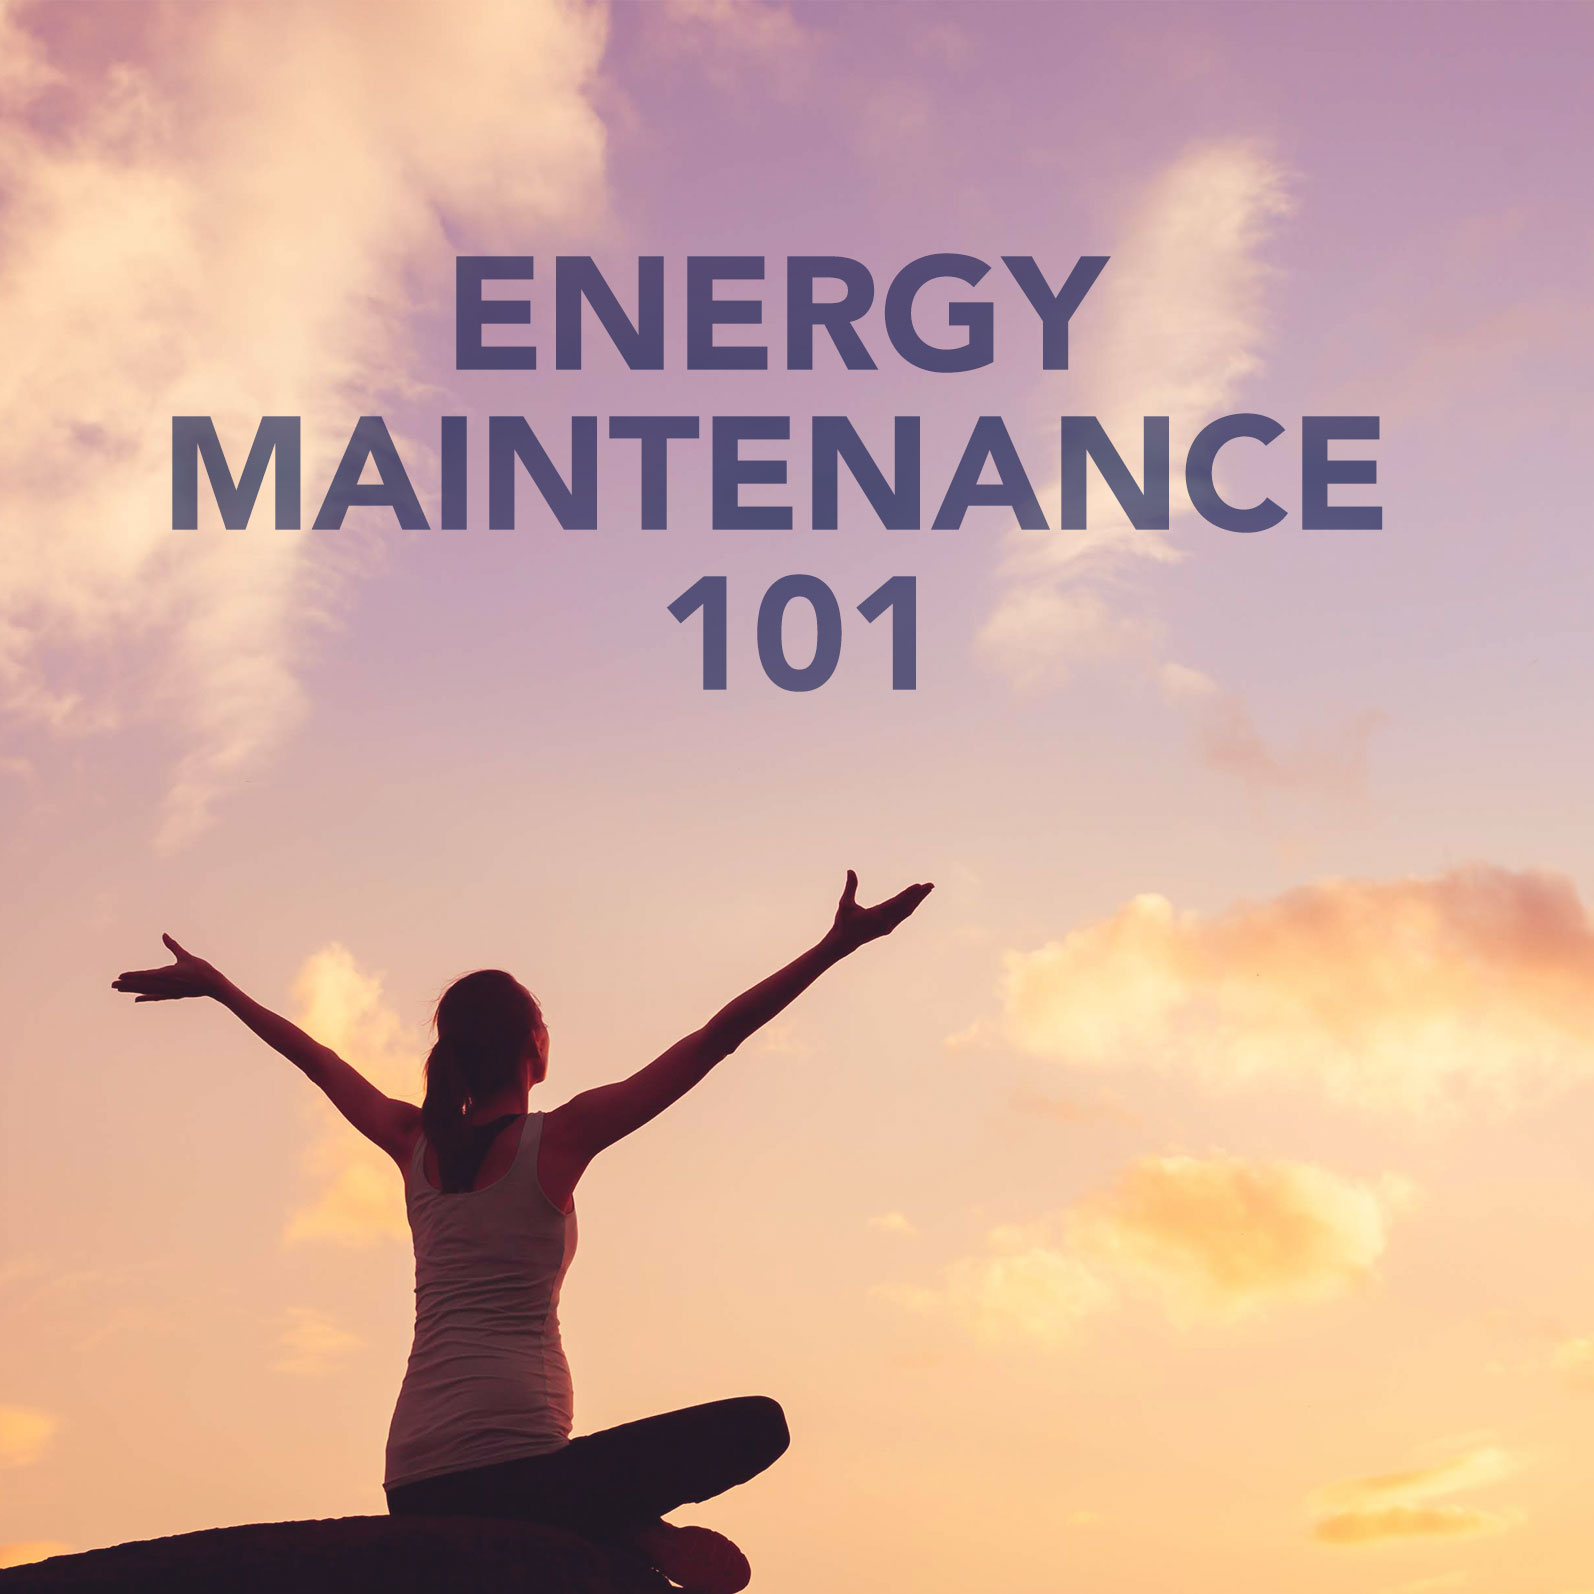 EnergyMaintenance_sq.jpg